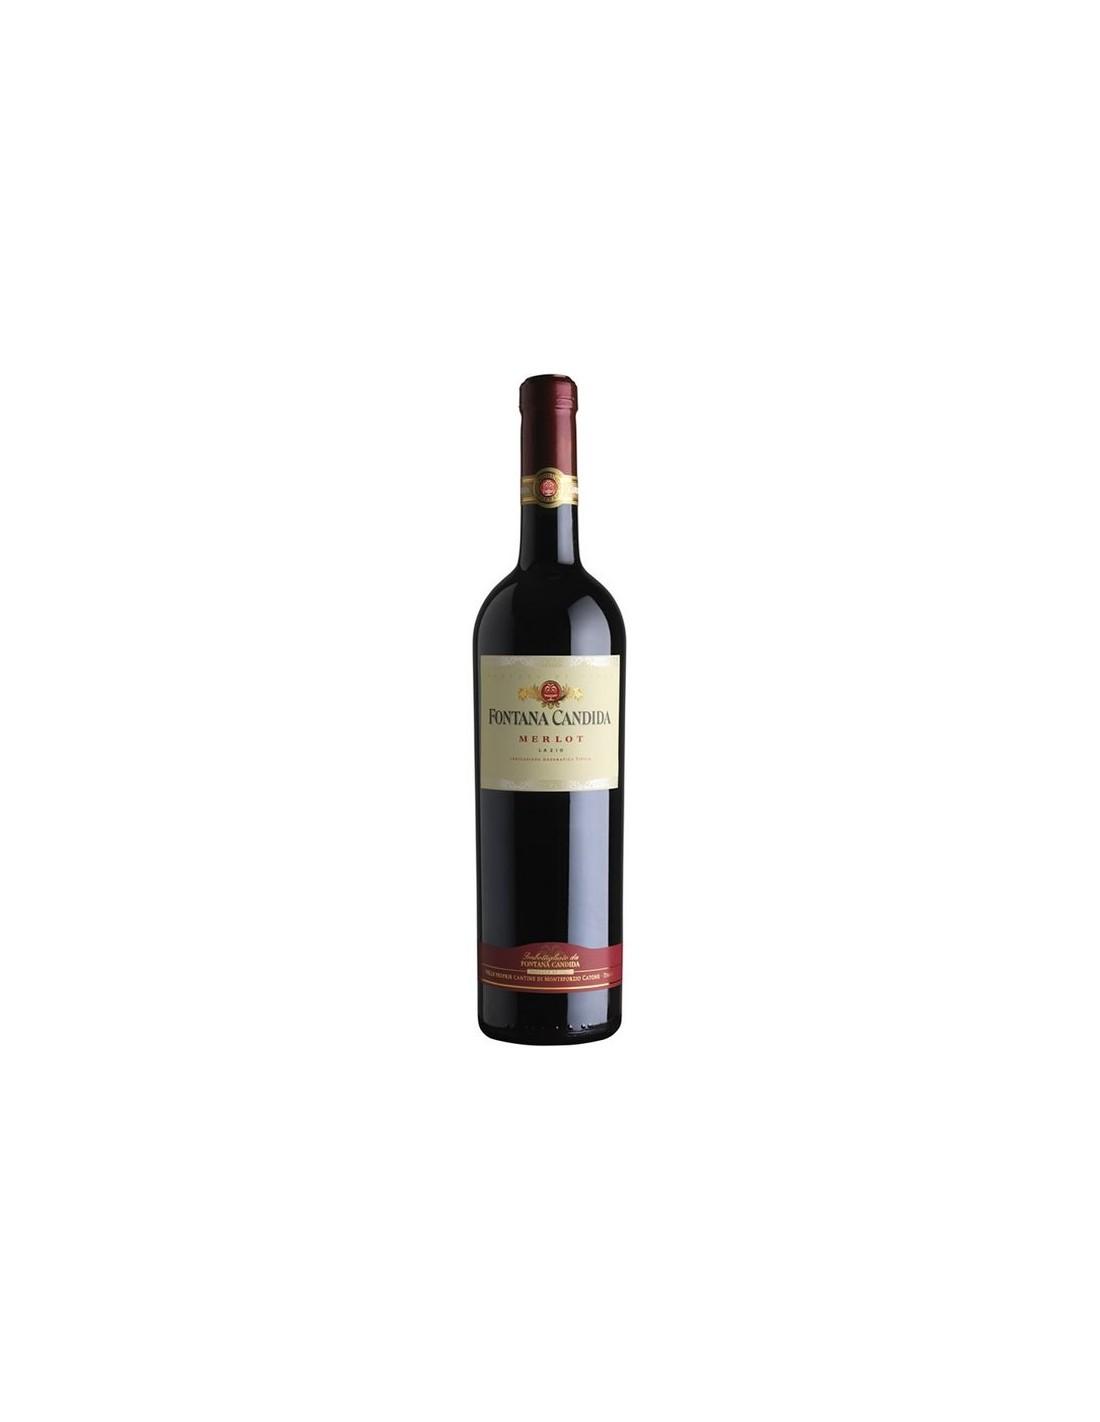 Vin rosu sec, Merlot, Fontana Candida Lazio, 0.75L, Italia